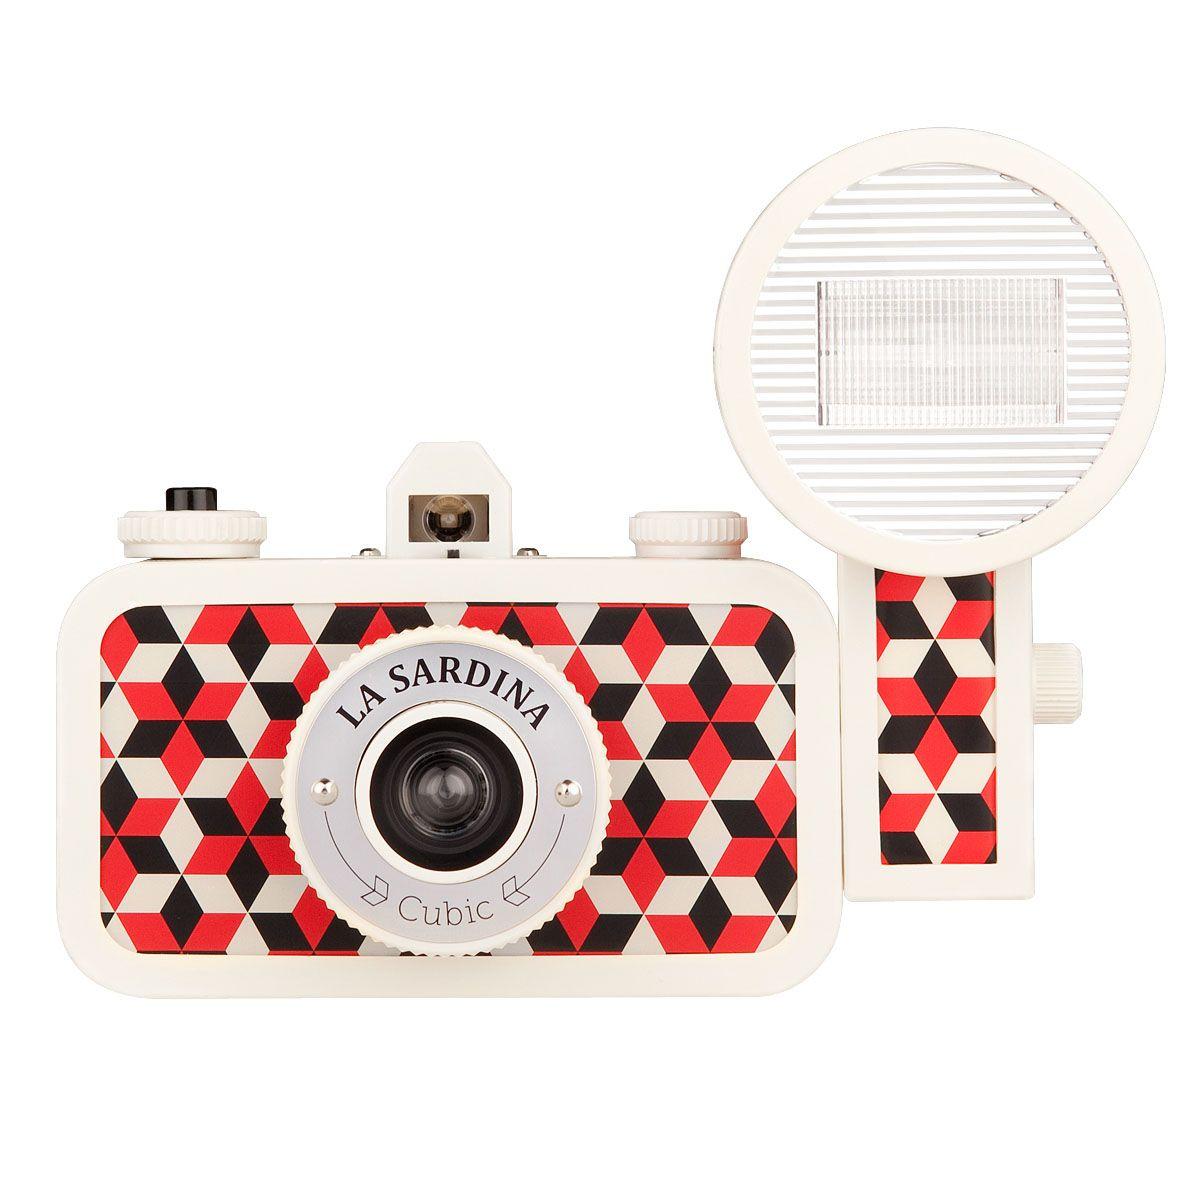 Lomography La Sardina Cubic Camera with Flash - Sweatband.com